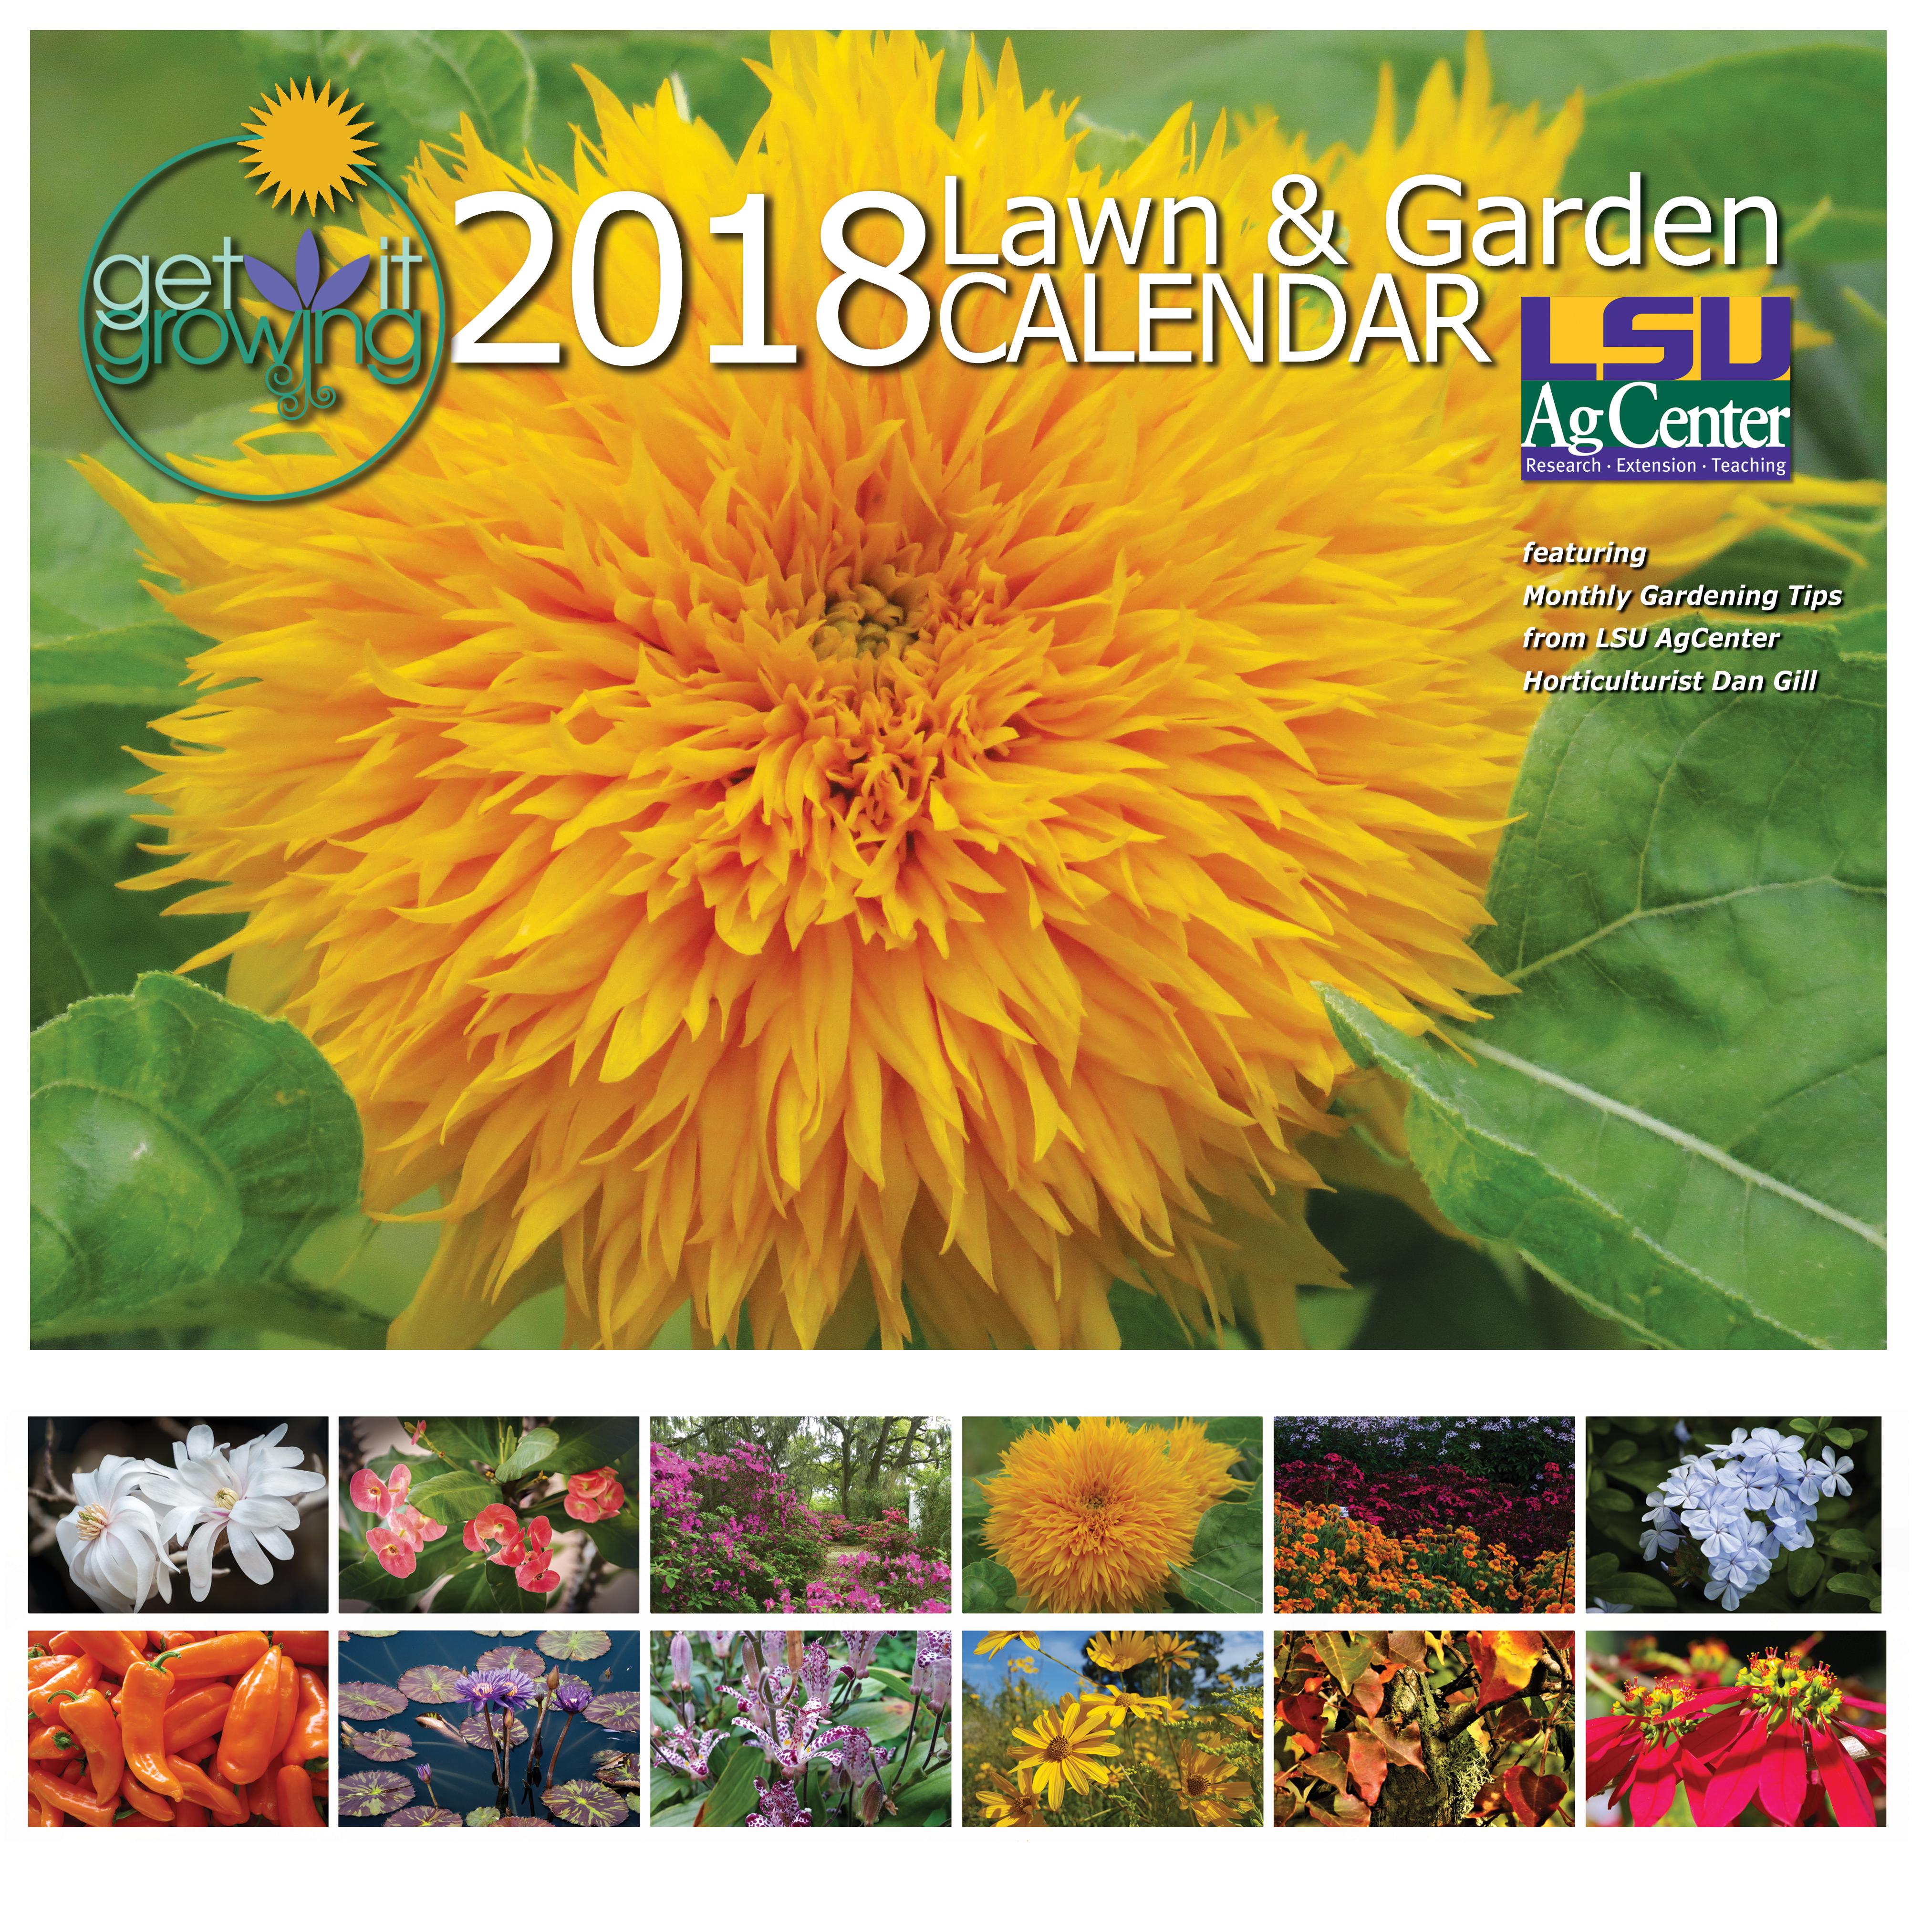 2018 get it growing lawn & garden calendar